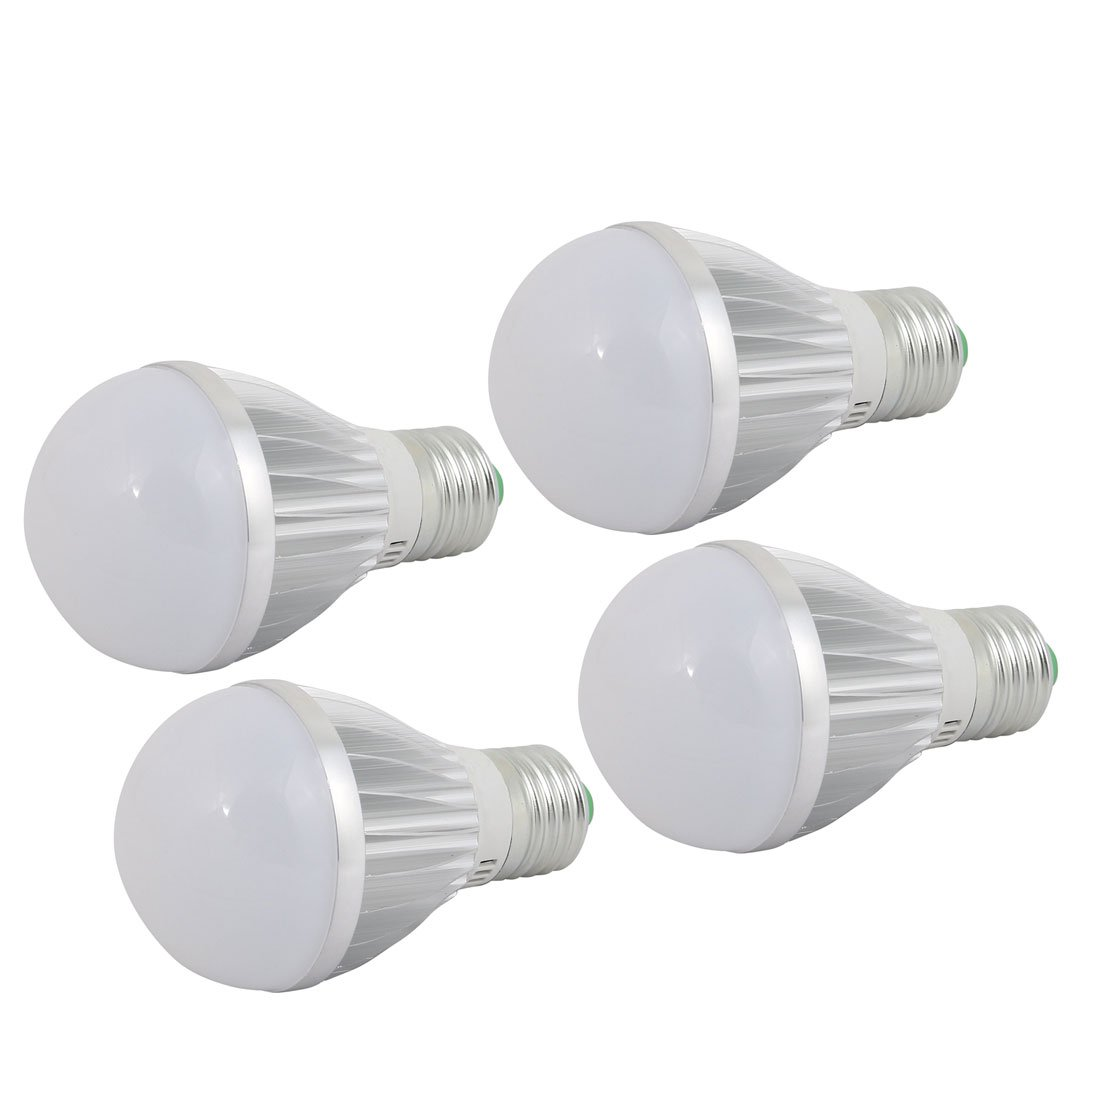 uxcell 4 Pcs 5W Sliver Aluminum Ball - Bulb Lamp Housing E27 Screw Base w White Cover